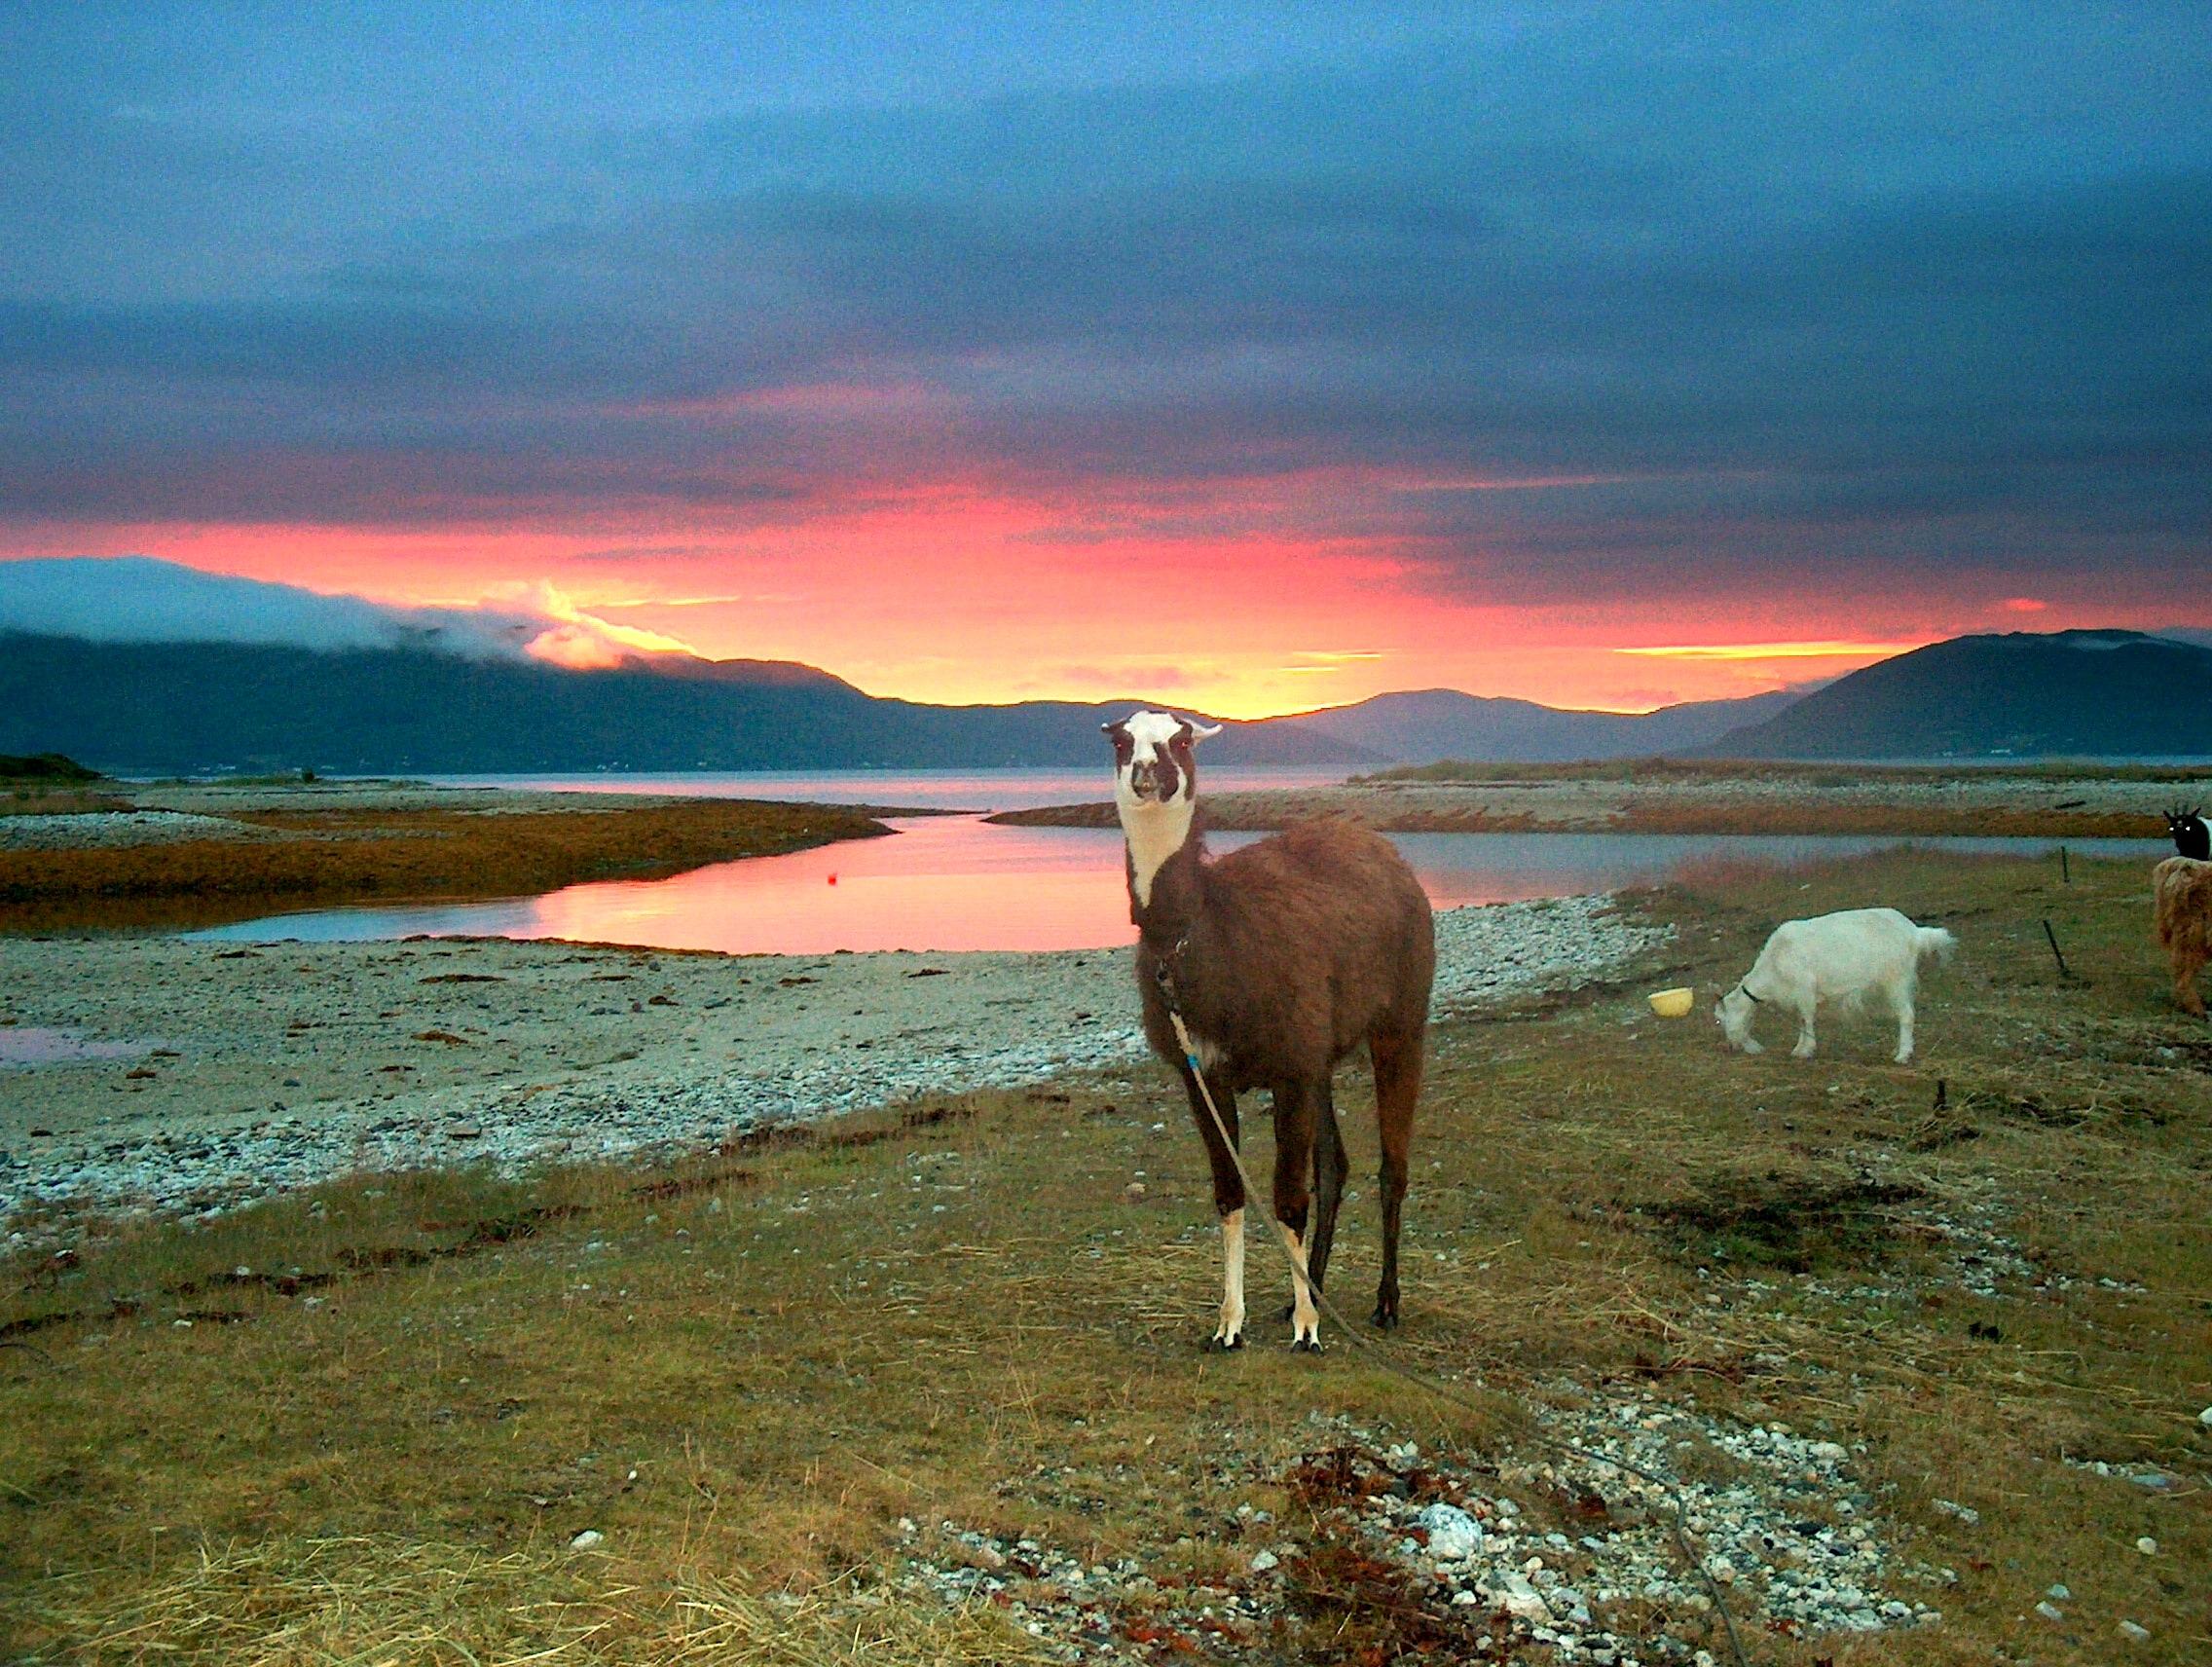 Lama i solnedgang.jpg